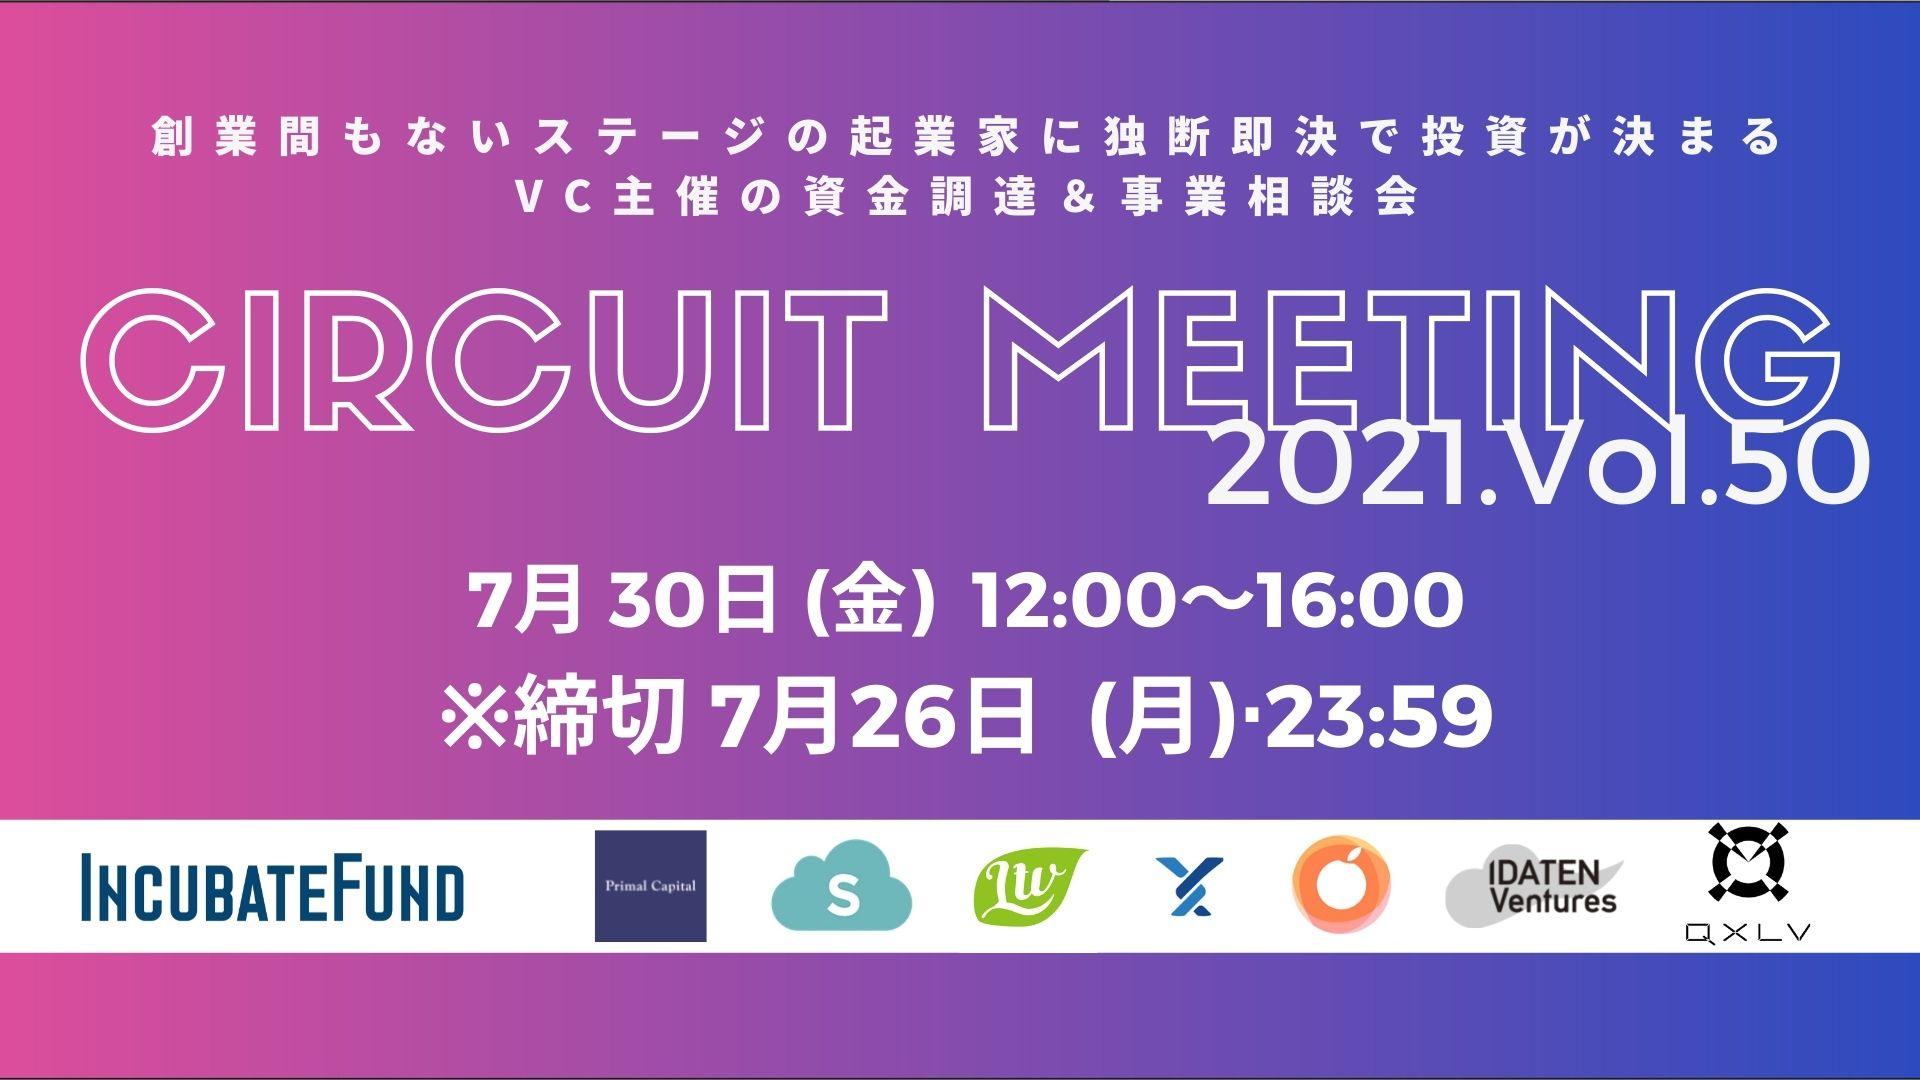 【7/26締切】Circuit Meeting Vol.50